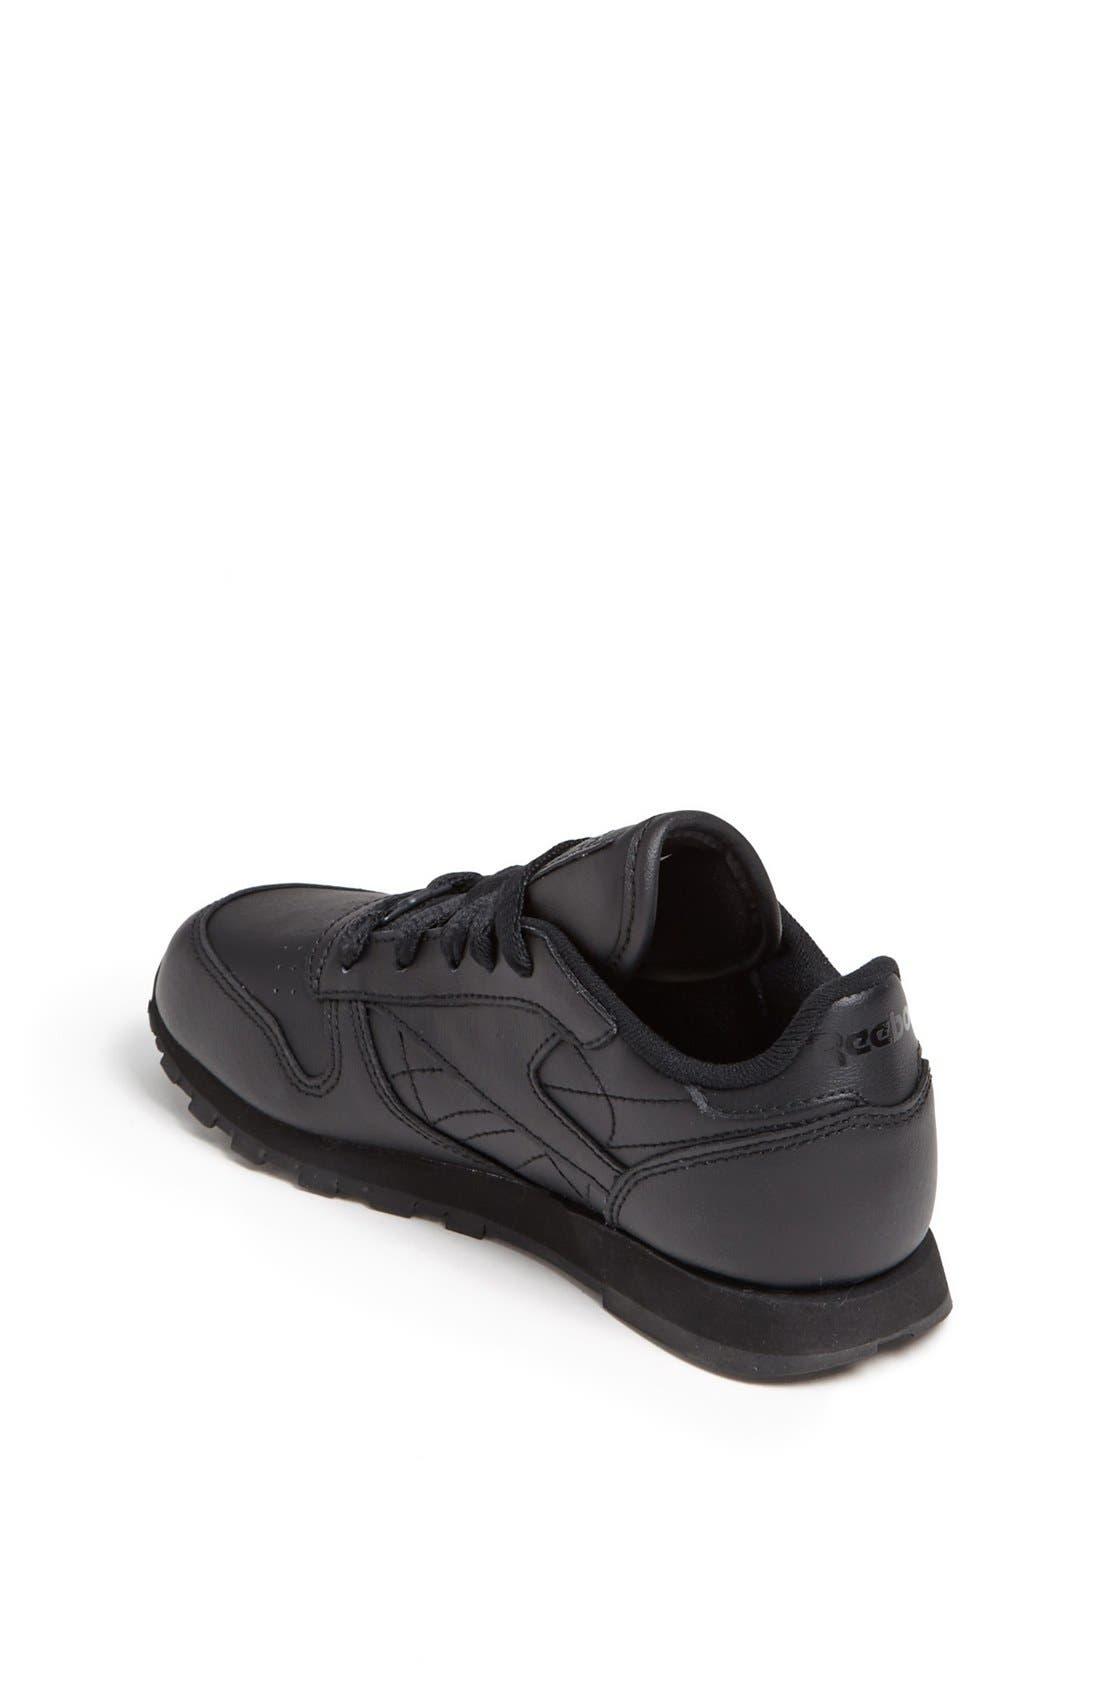 Alternate Image 2  - Reebok 'Classic' Leather Sneaker (Toddler & Little Kid)